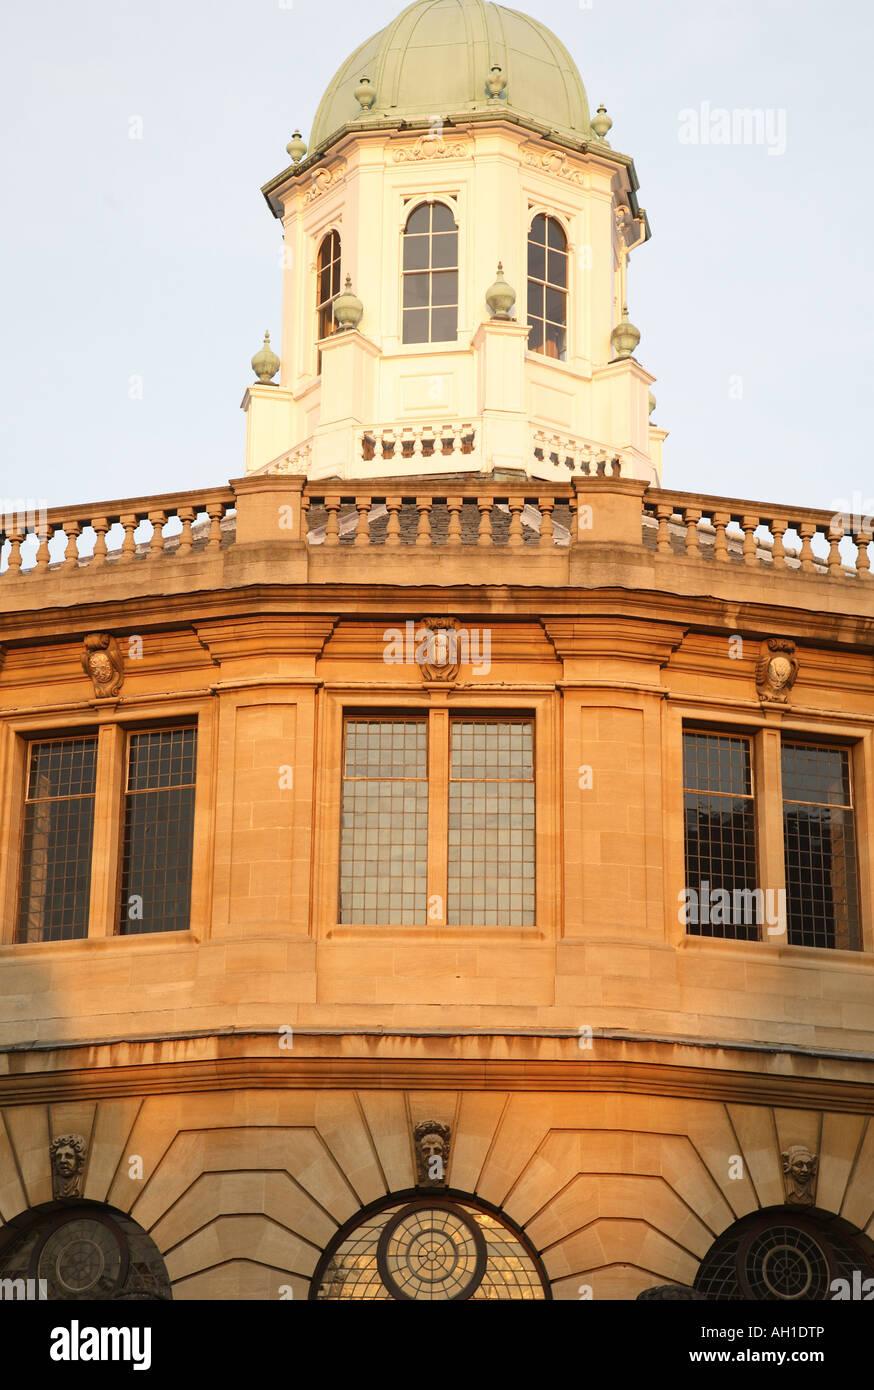 Sheldonian Theatre, Oxford University, England, UK Stock Photo